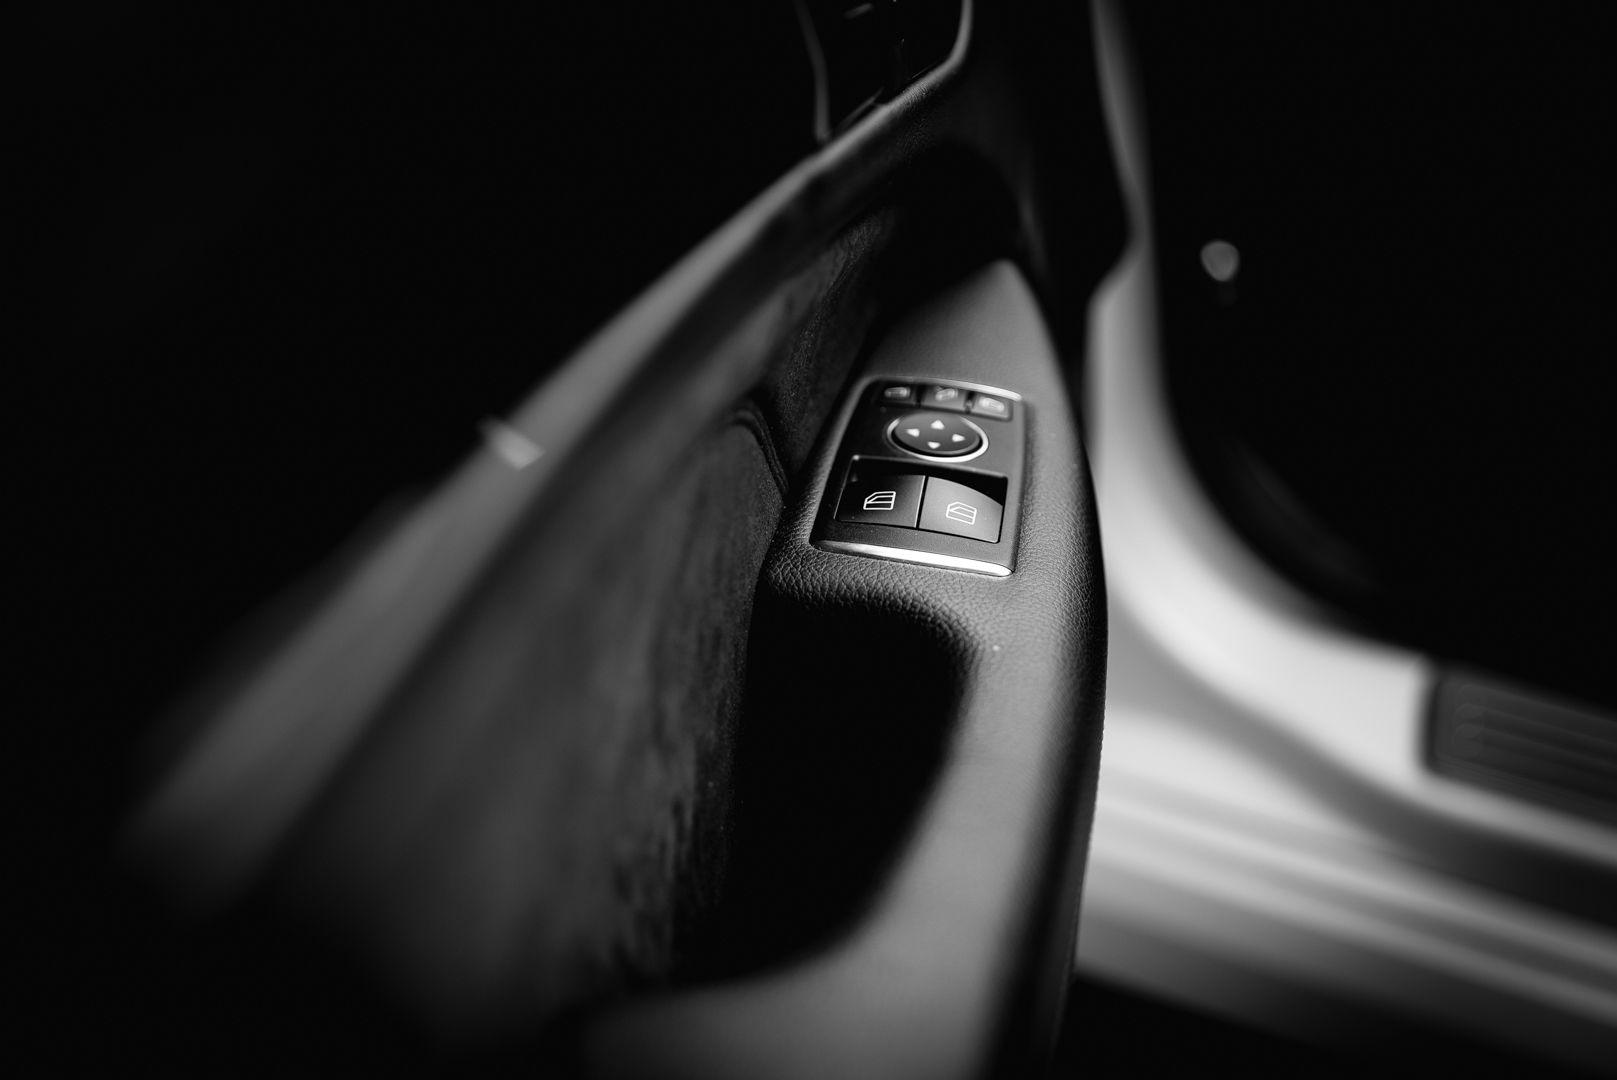 2012 Mercedes-Benz C63 AMG Black Series 71802